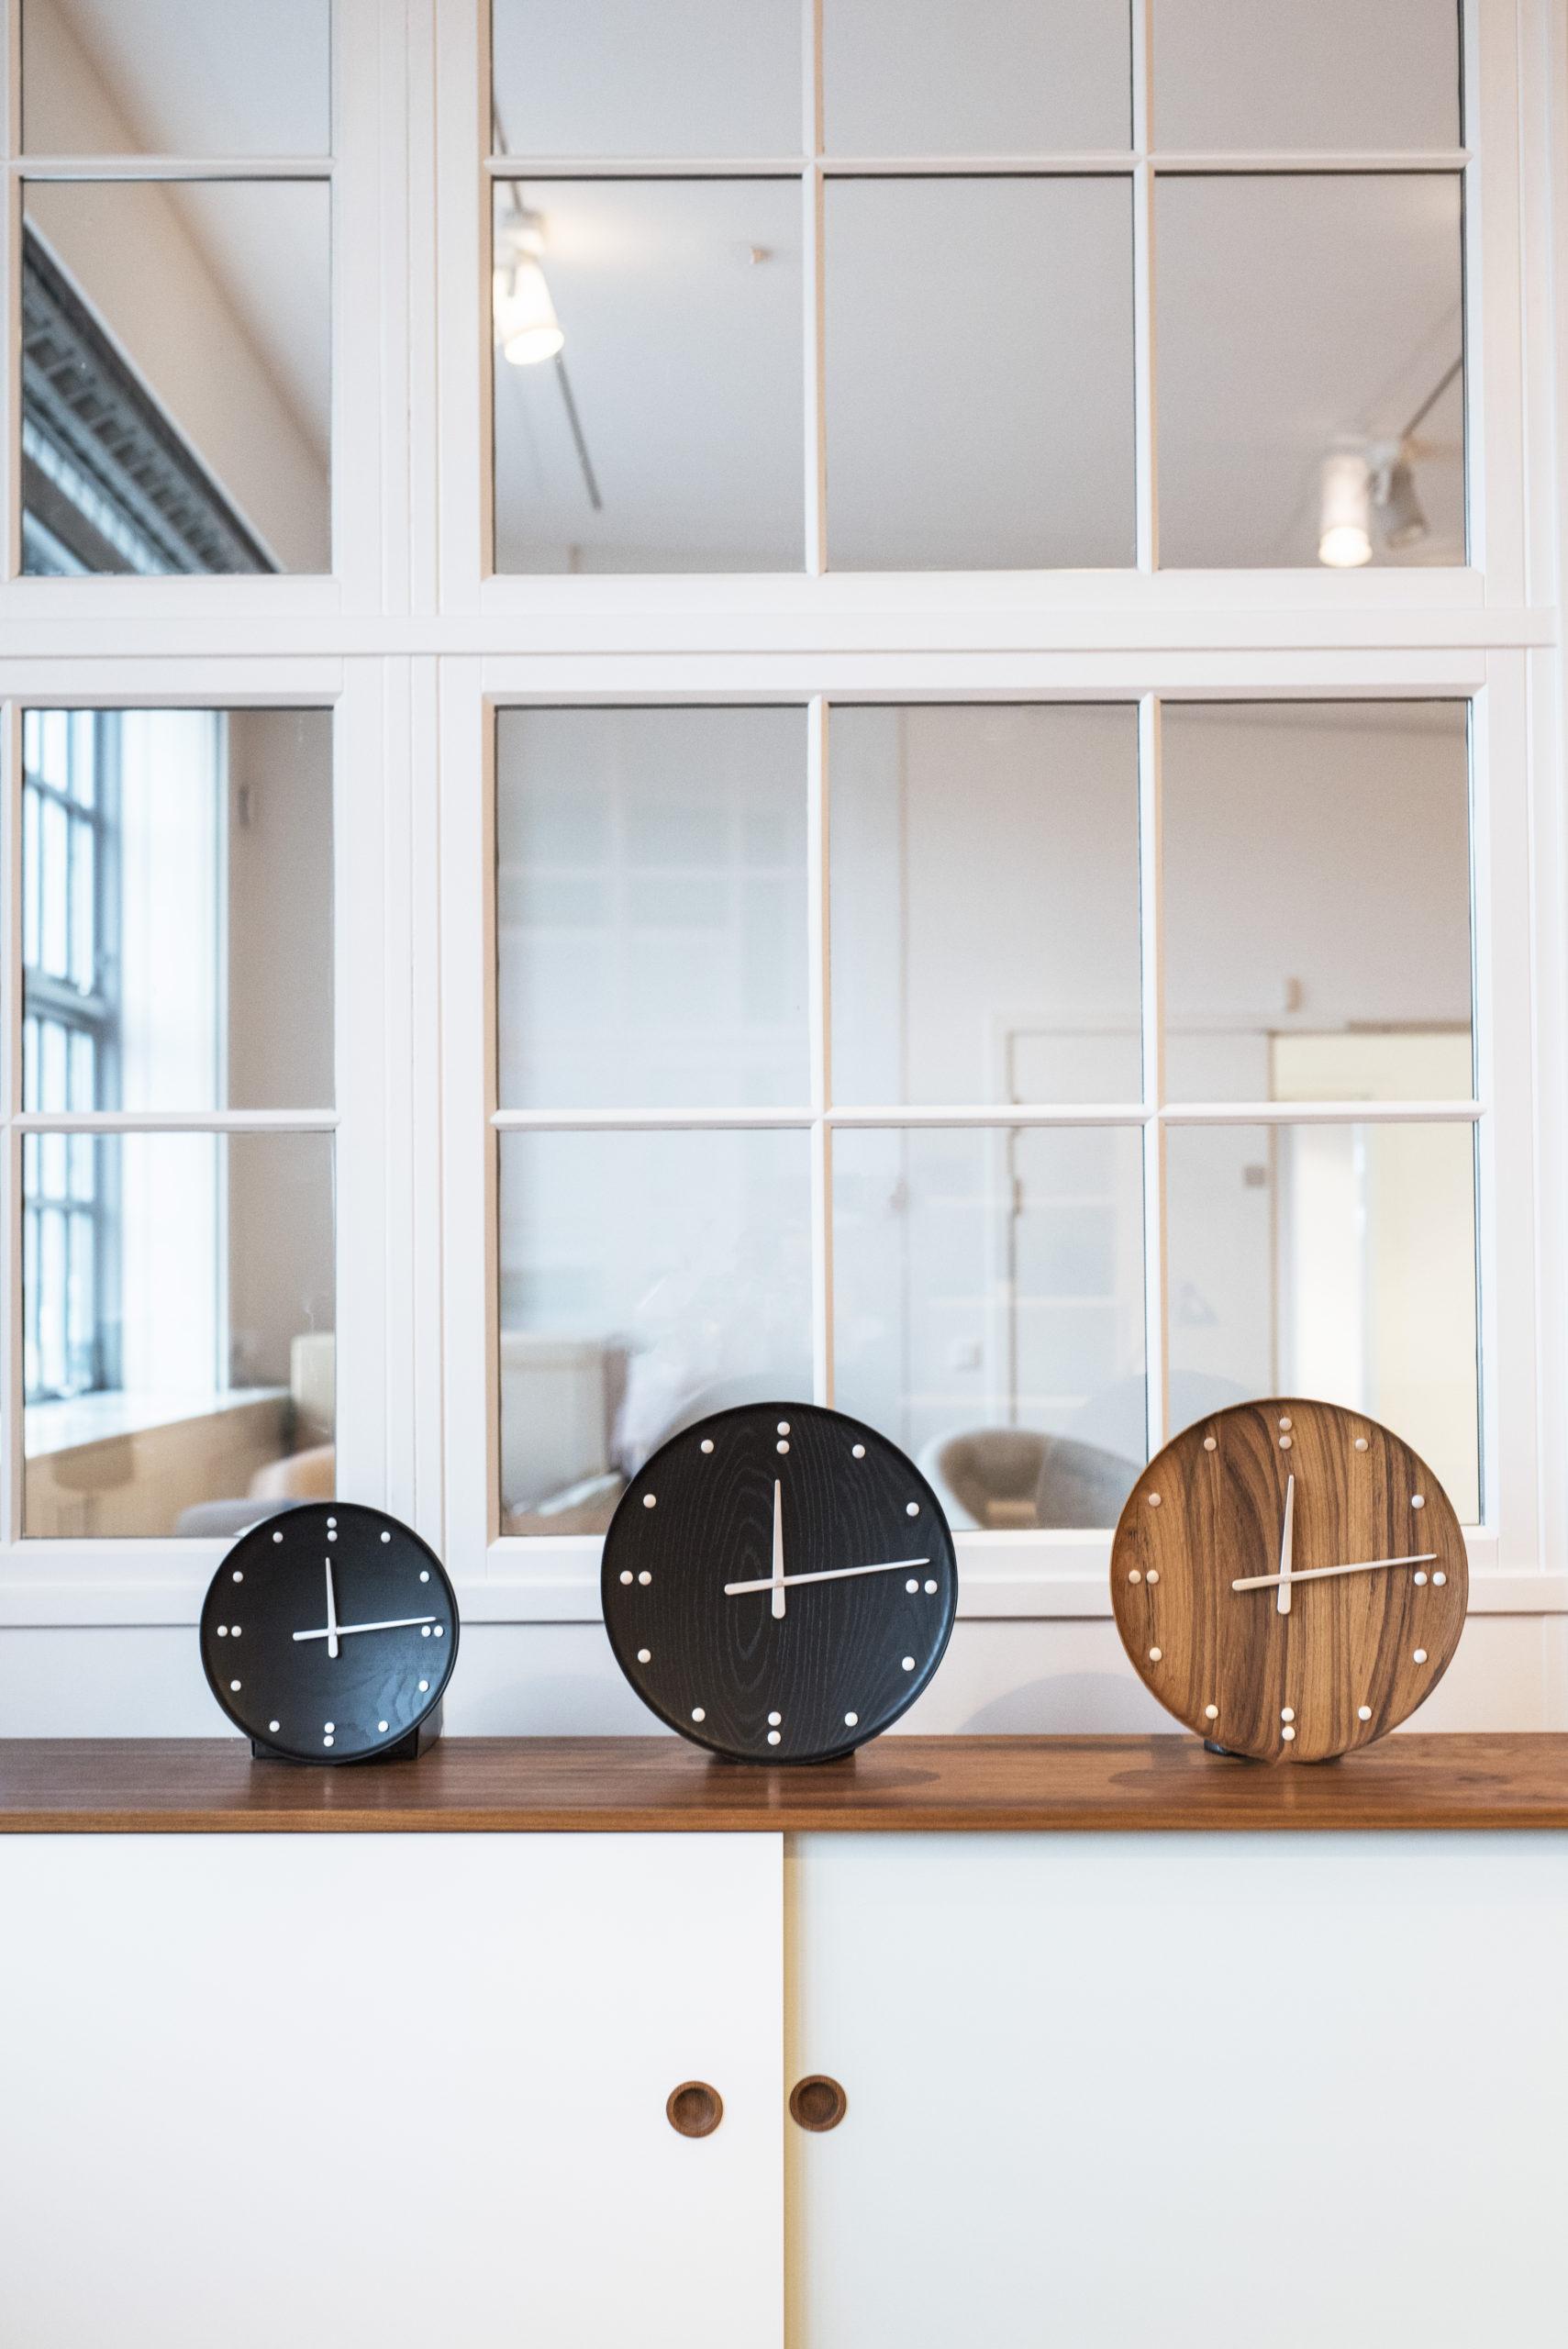 Architectmade-FJ-Clock-Wall-Clock-Teak-and-Ash-Wood-Denmark-Finn-Juhl-3